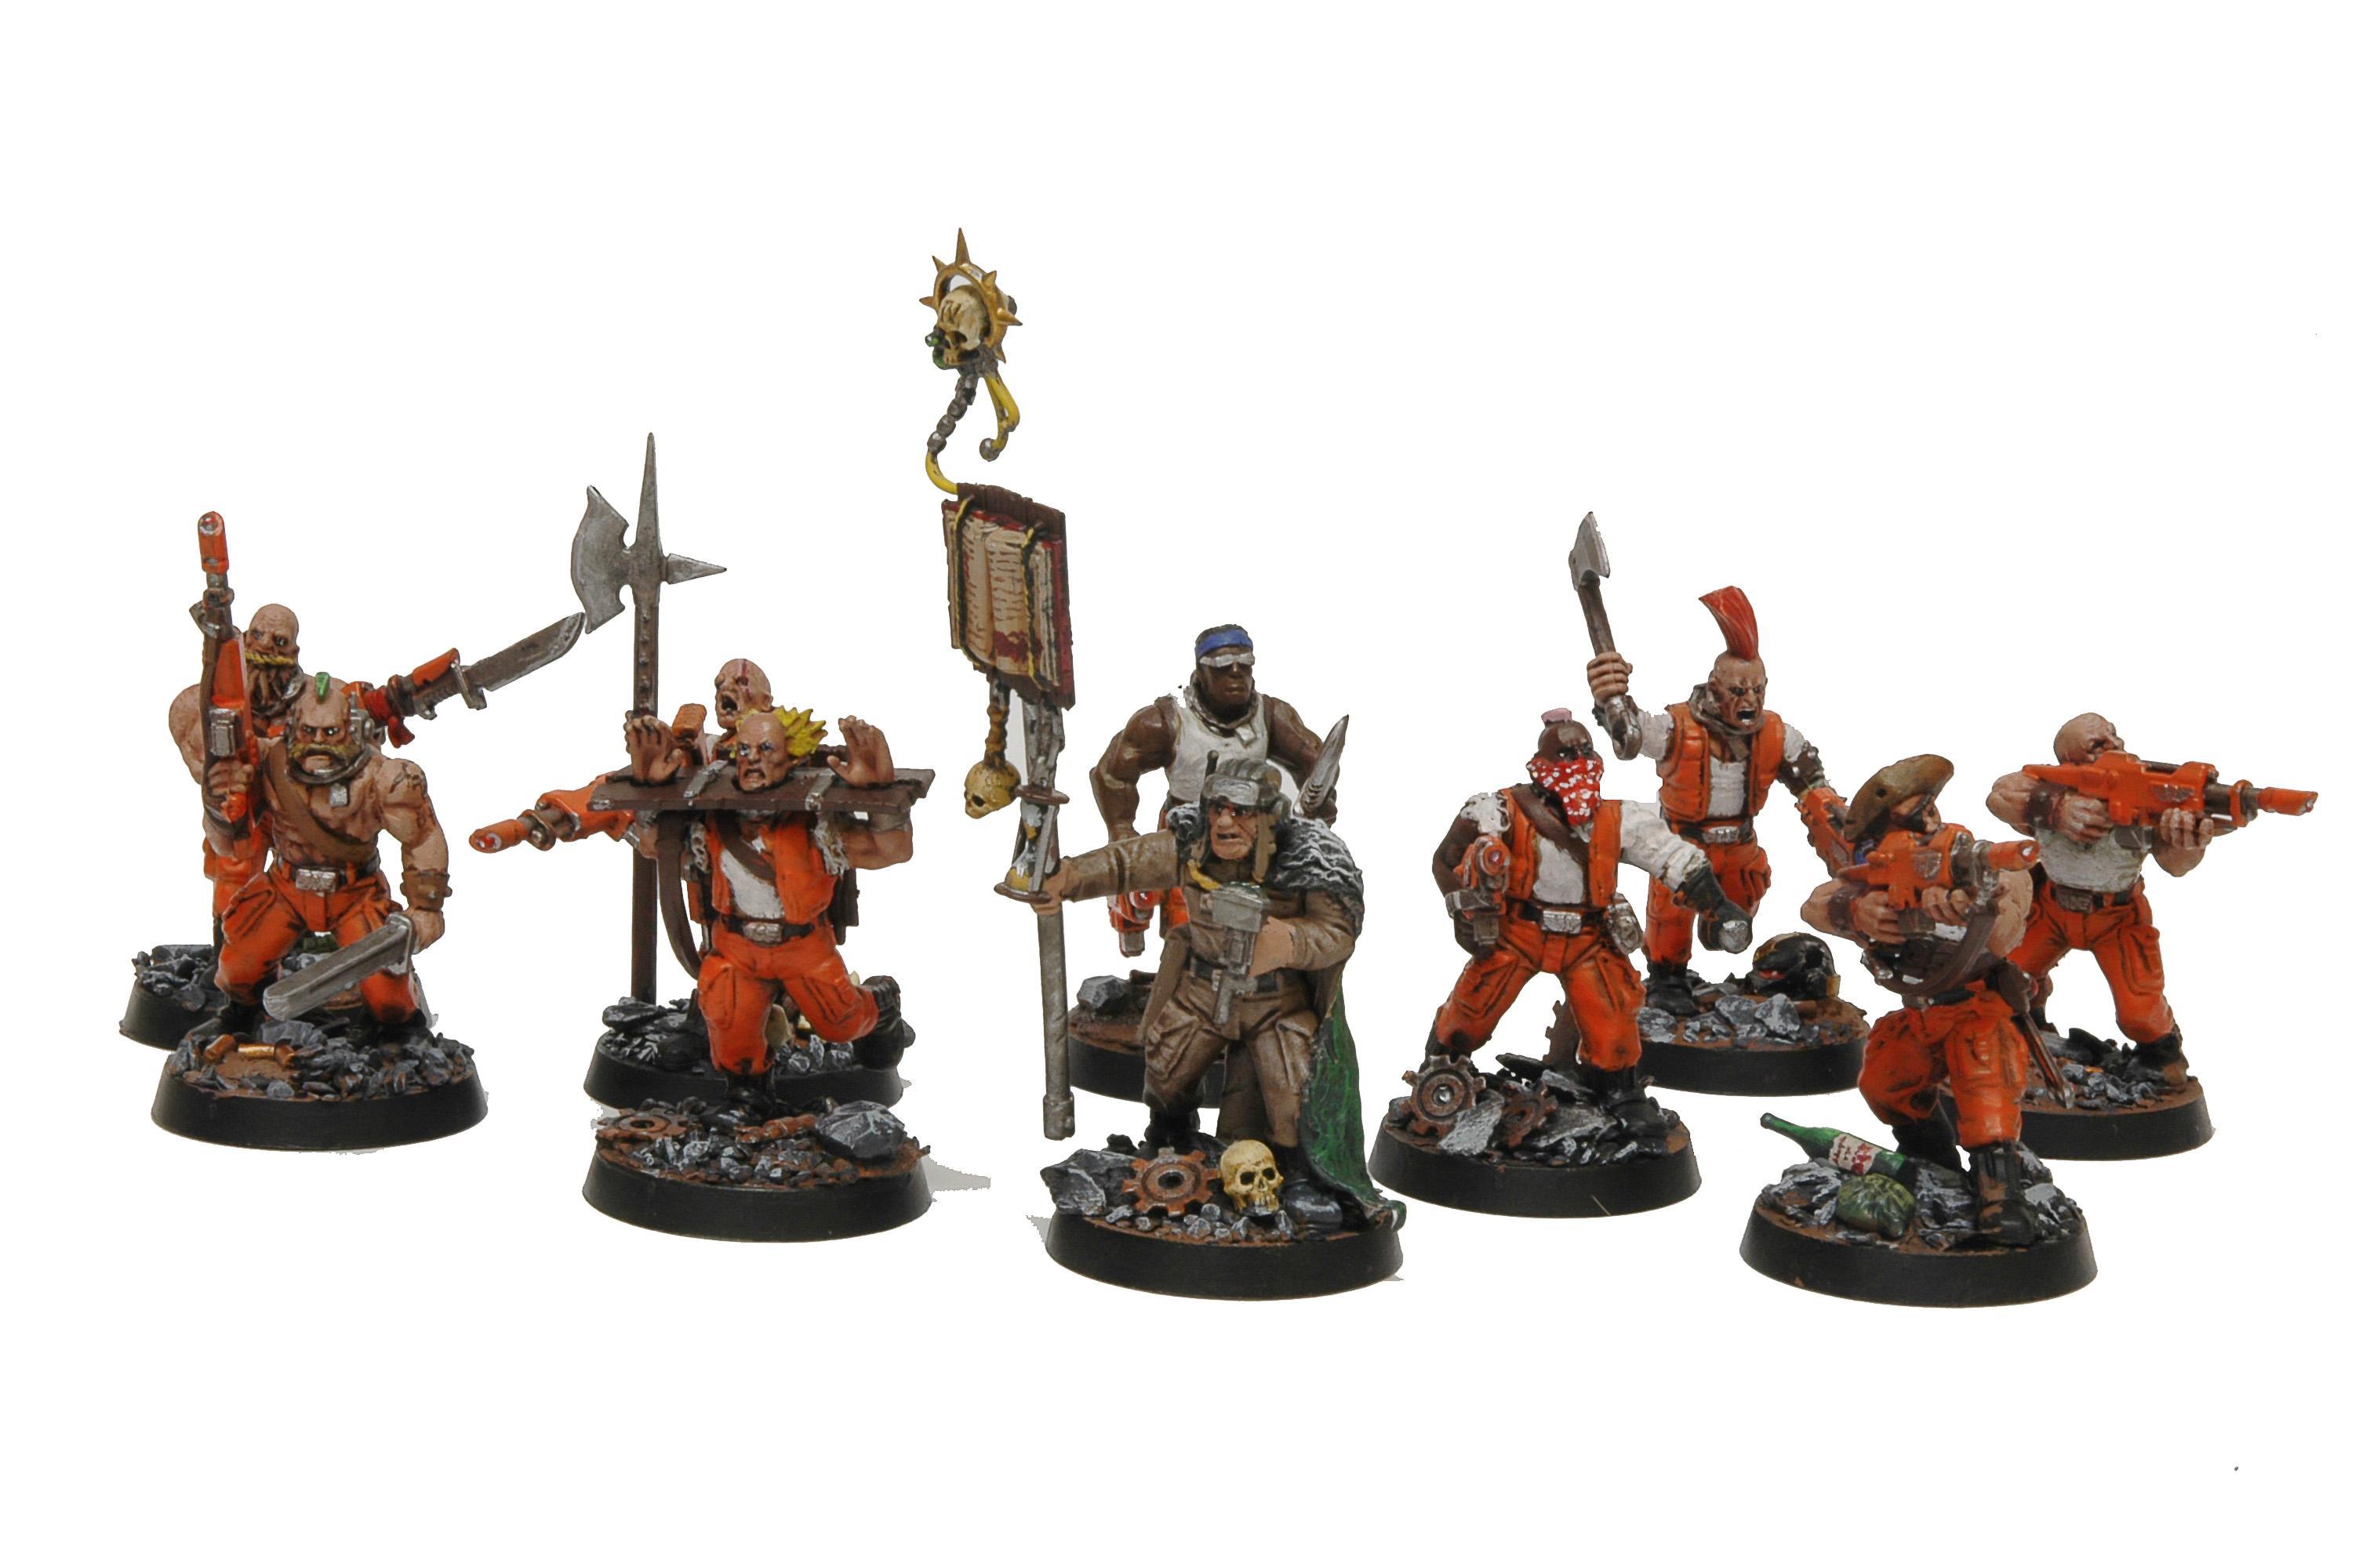 Cavalry, Guard, Imperial Guard, Penal Legion, Rough Riders, Sentinel, Walker